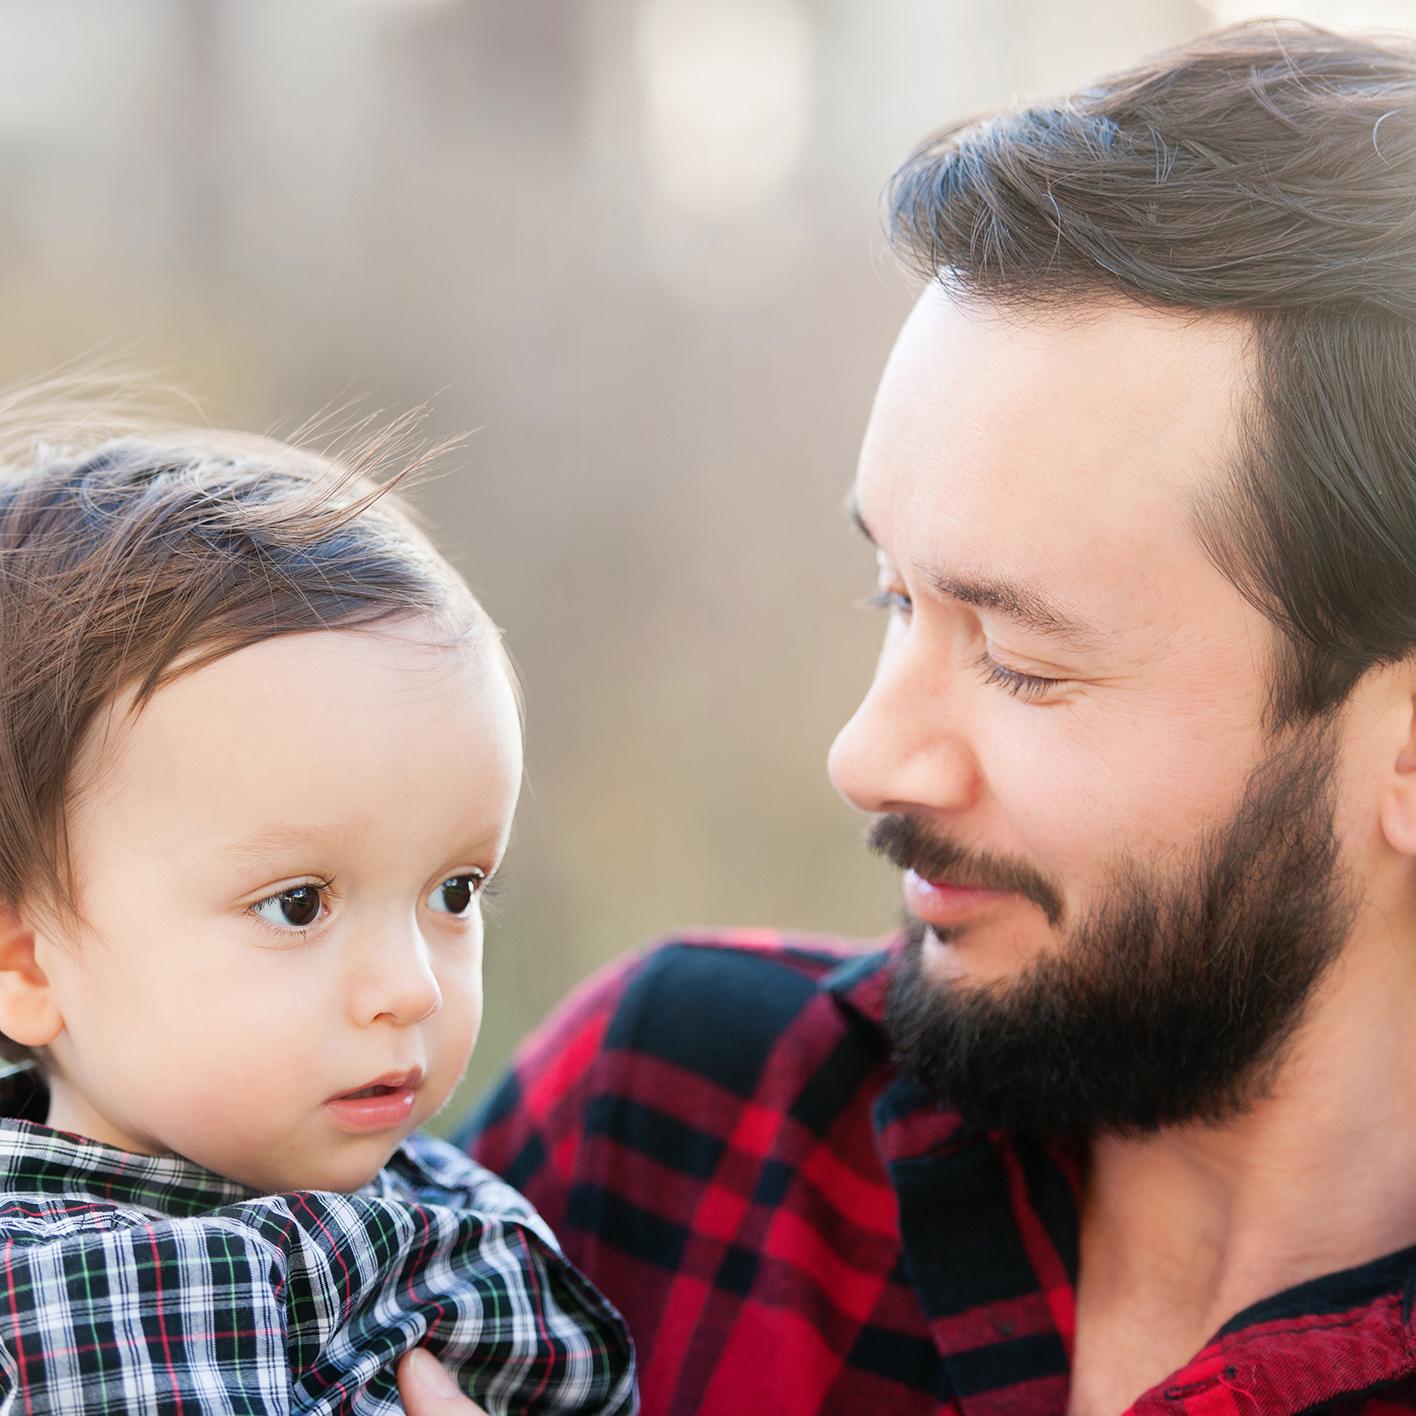 austin birthday newborn family lifestyle photographer ziem photography Aseron